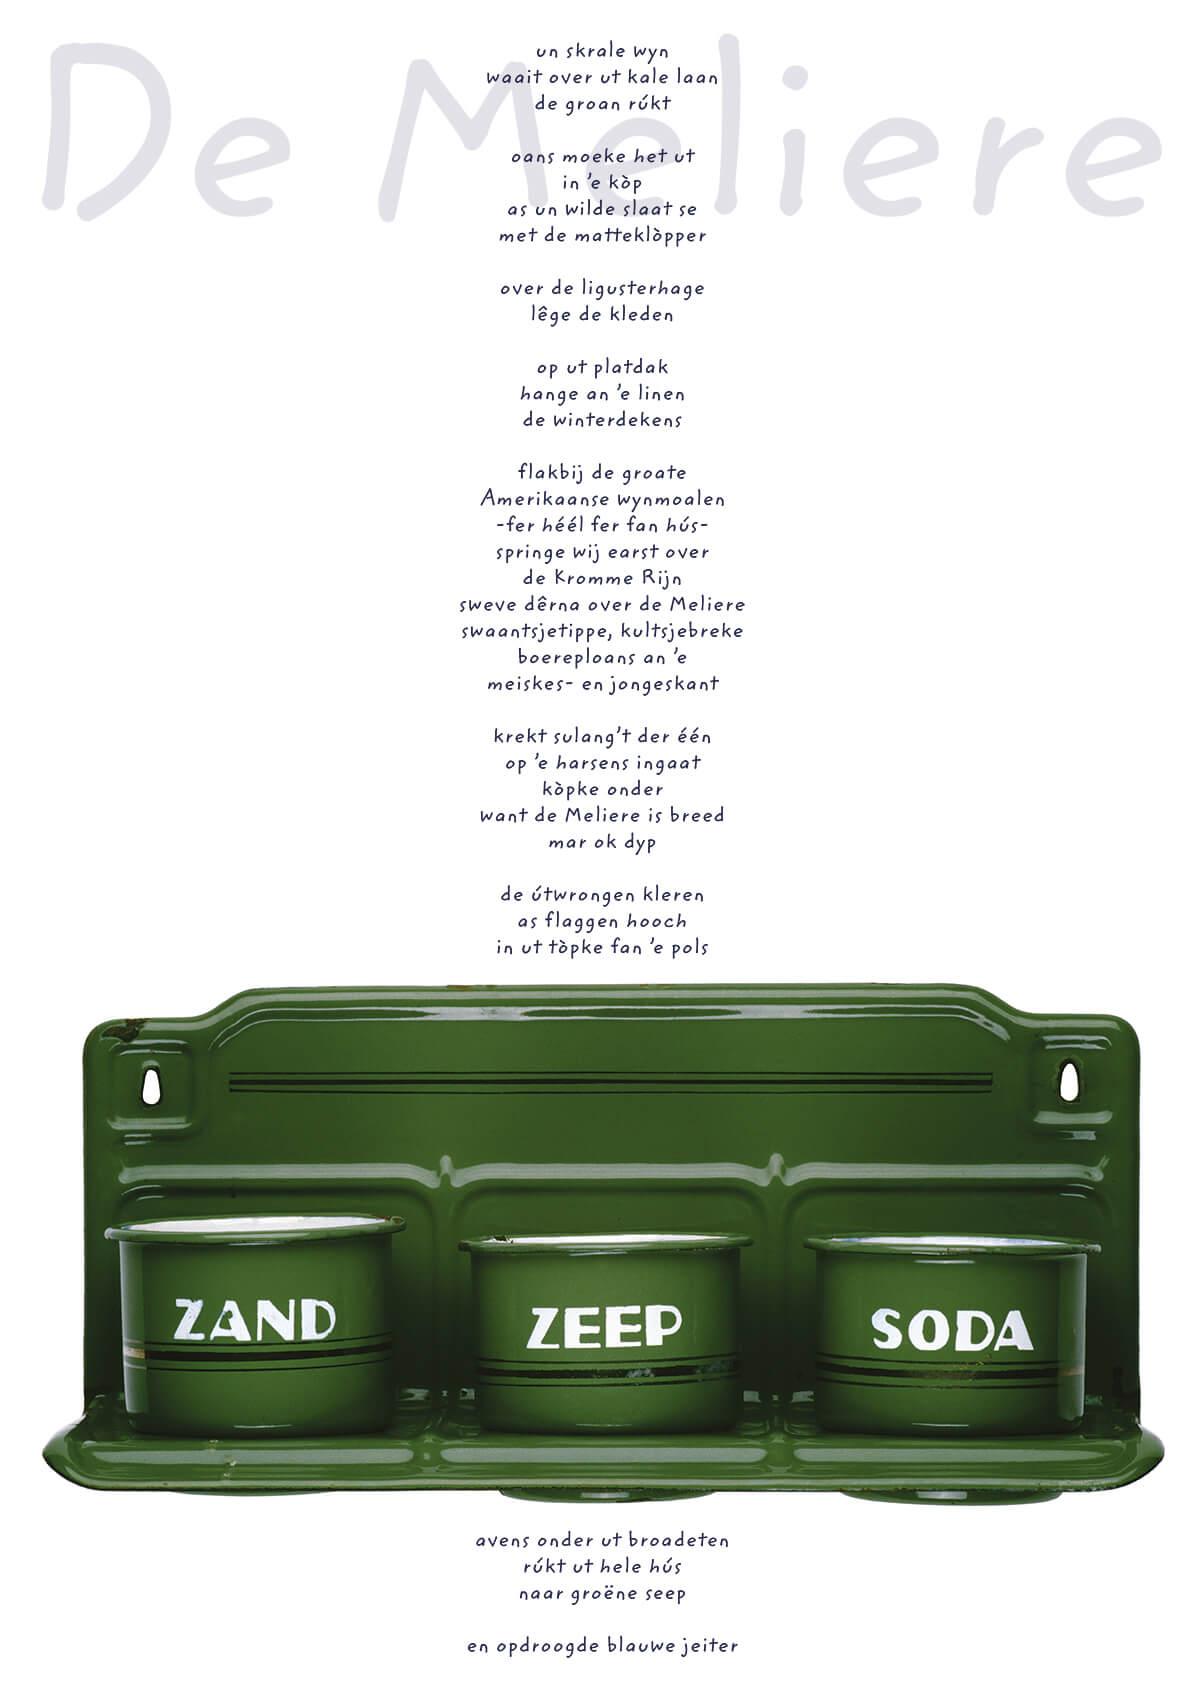 zand-zeep-soda-blikjes